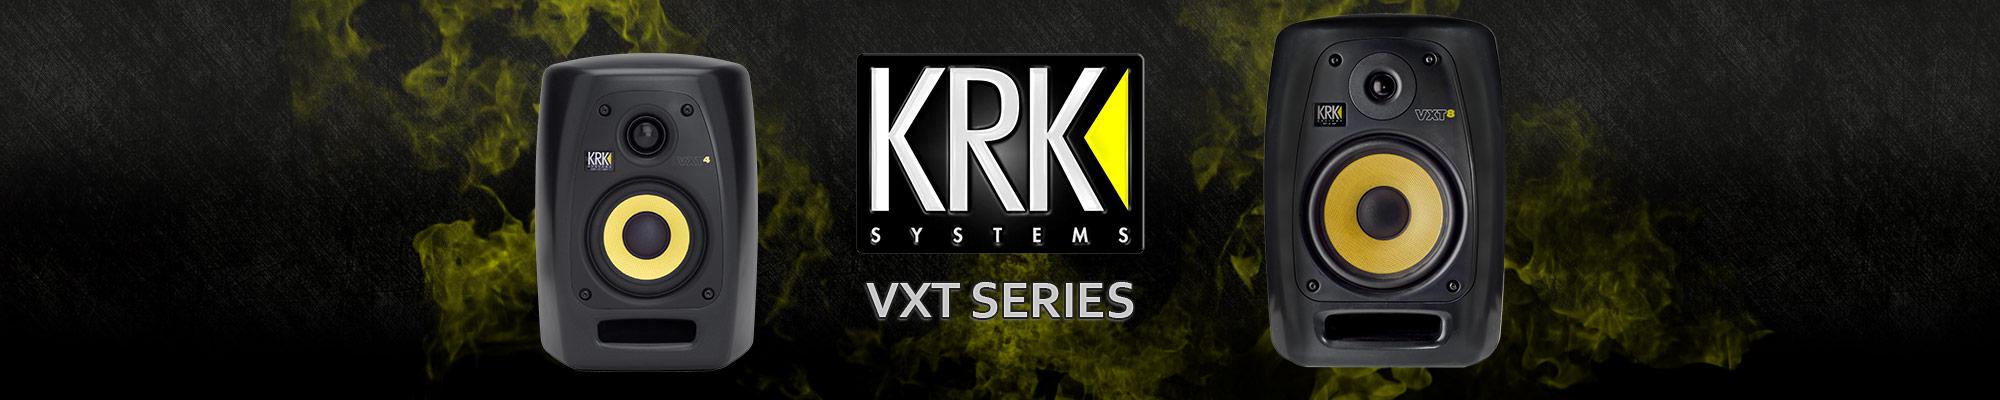 KRK Systems VXT Series